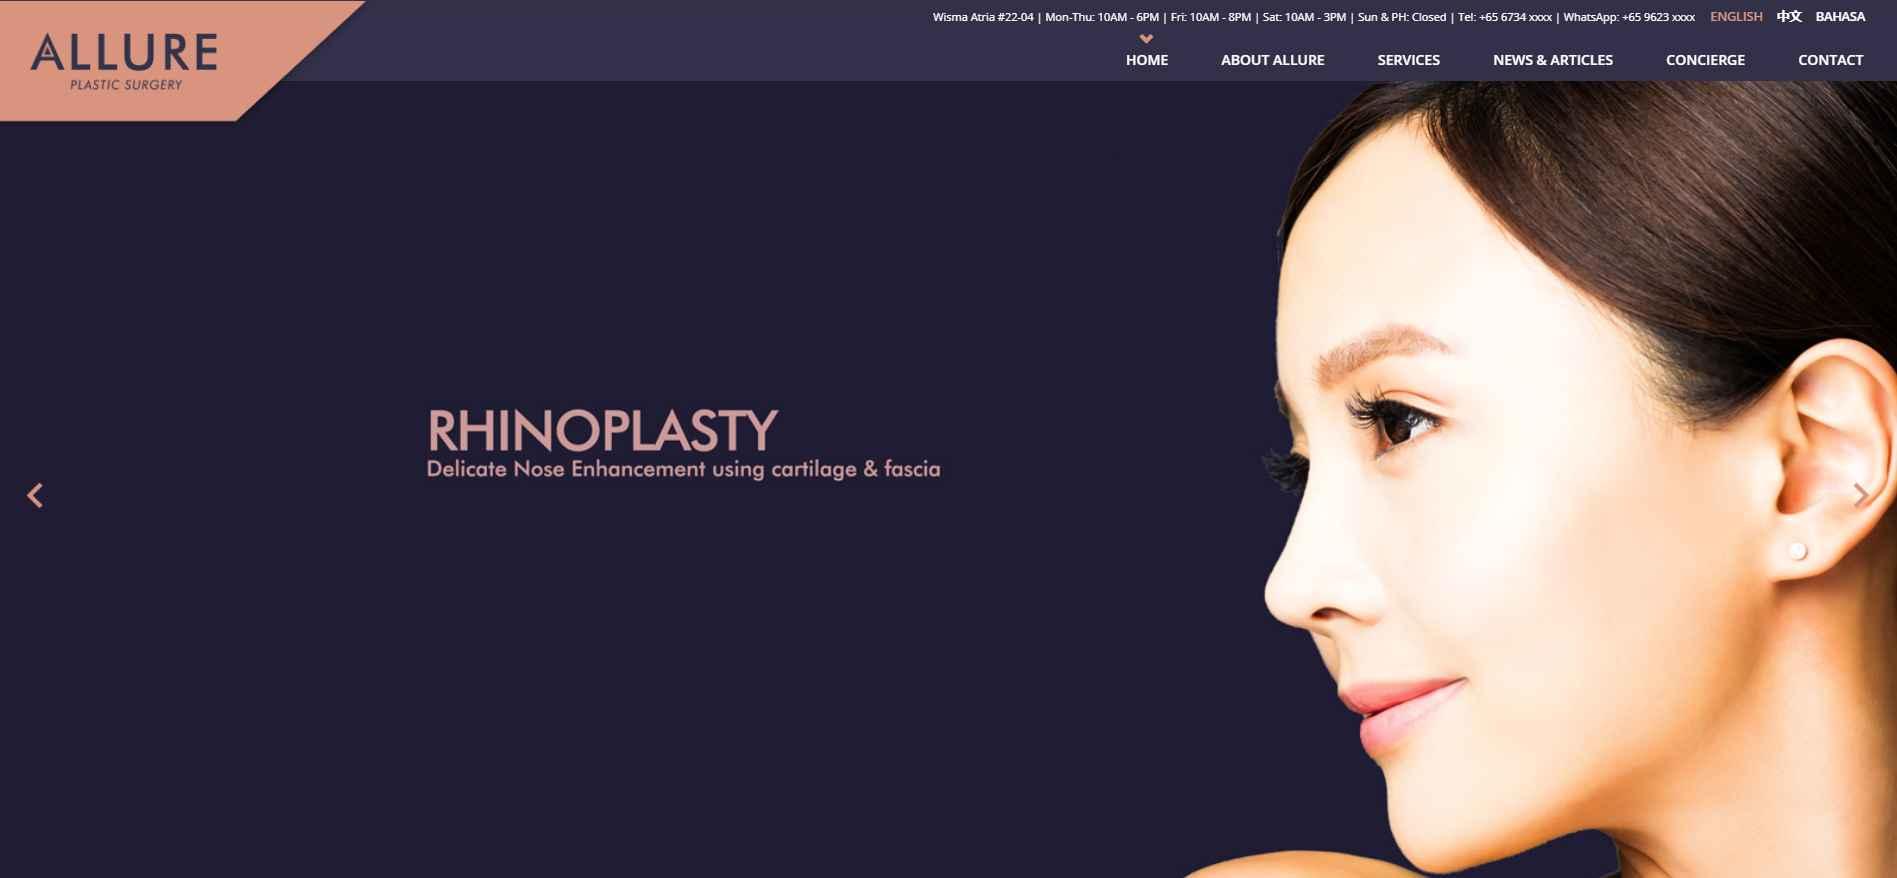 allure Top Breast Implant Clinics in Singapore